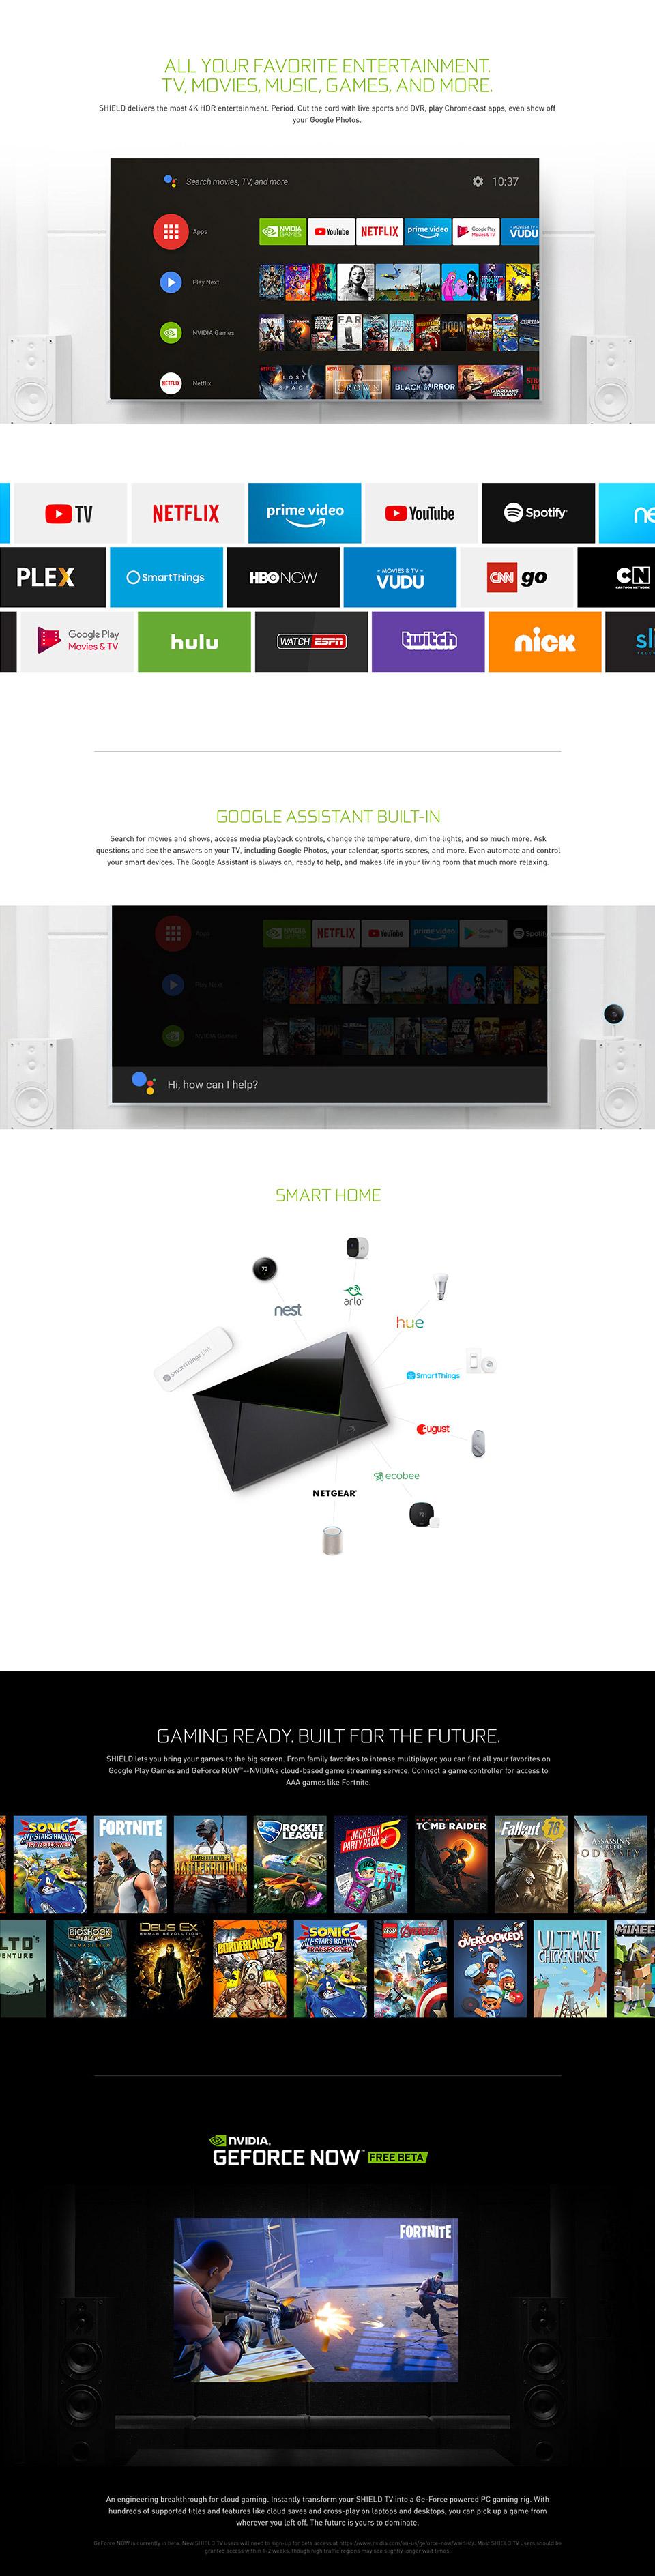 Nvidia Shield TV features 2